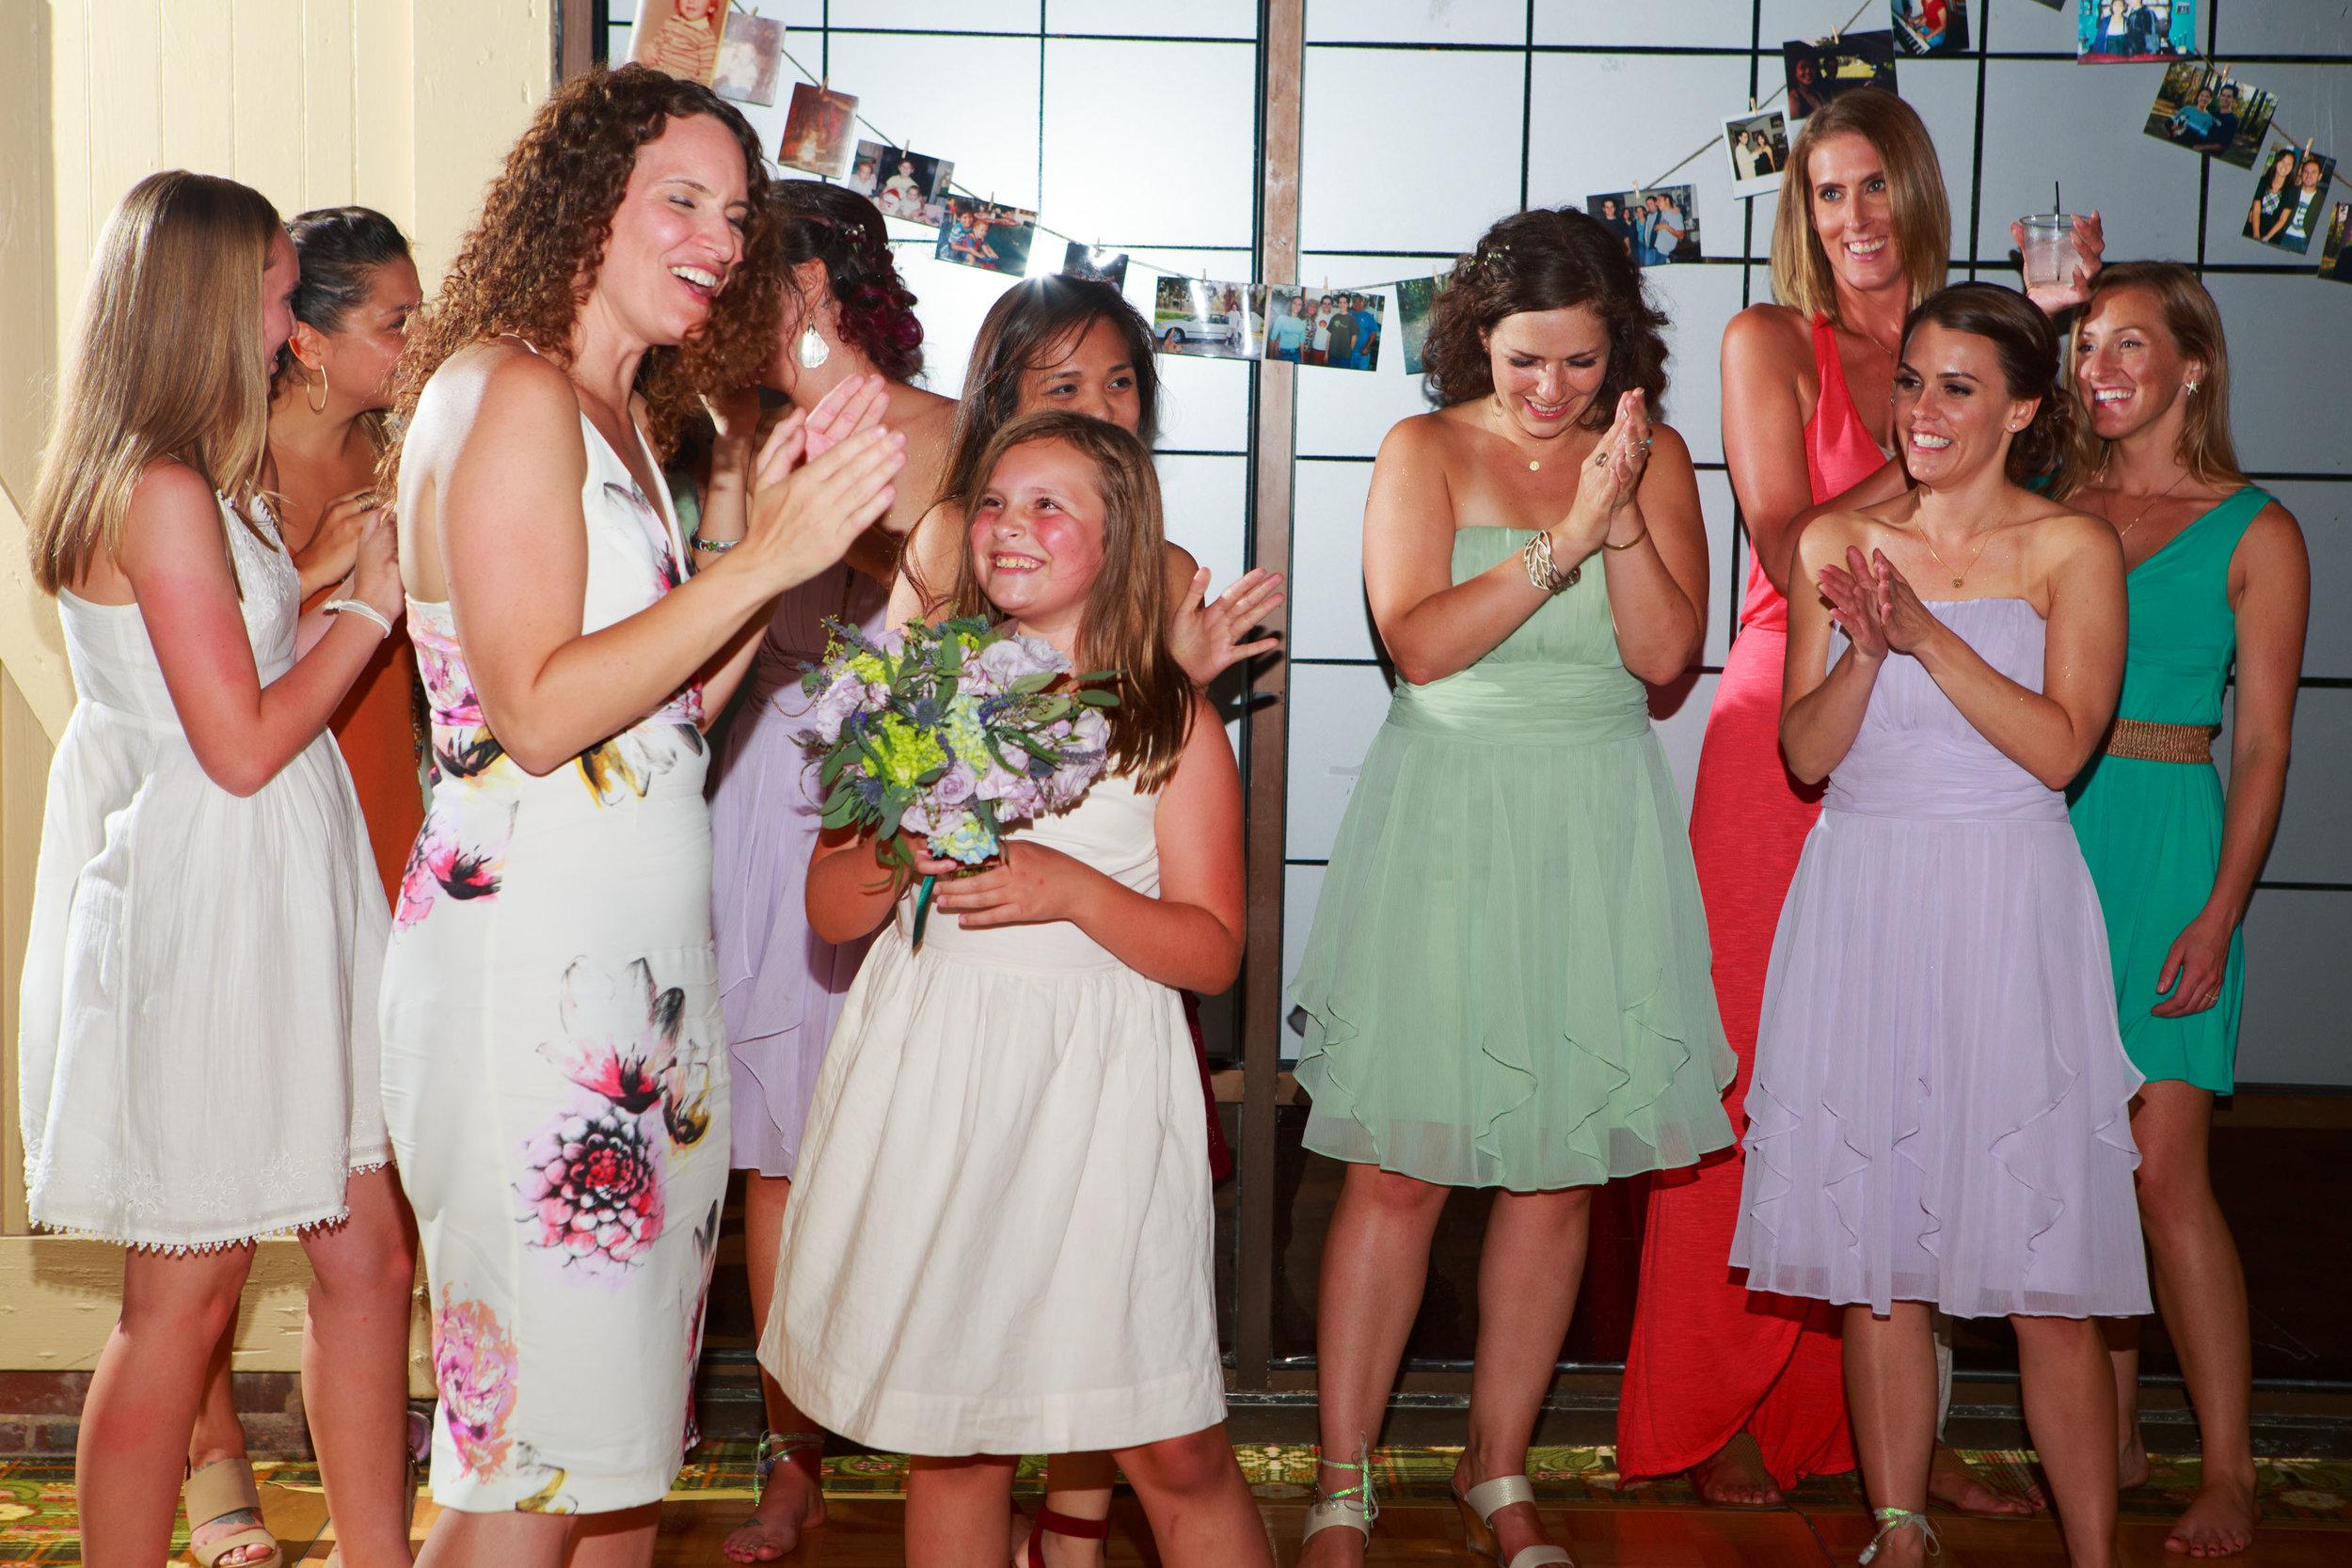 North_Carolina_Wedding_Photographer_Tiffany_Abruzzo_Reception_287.jpg